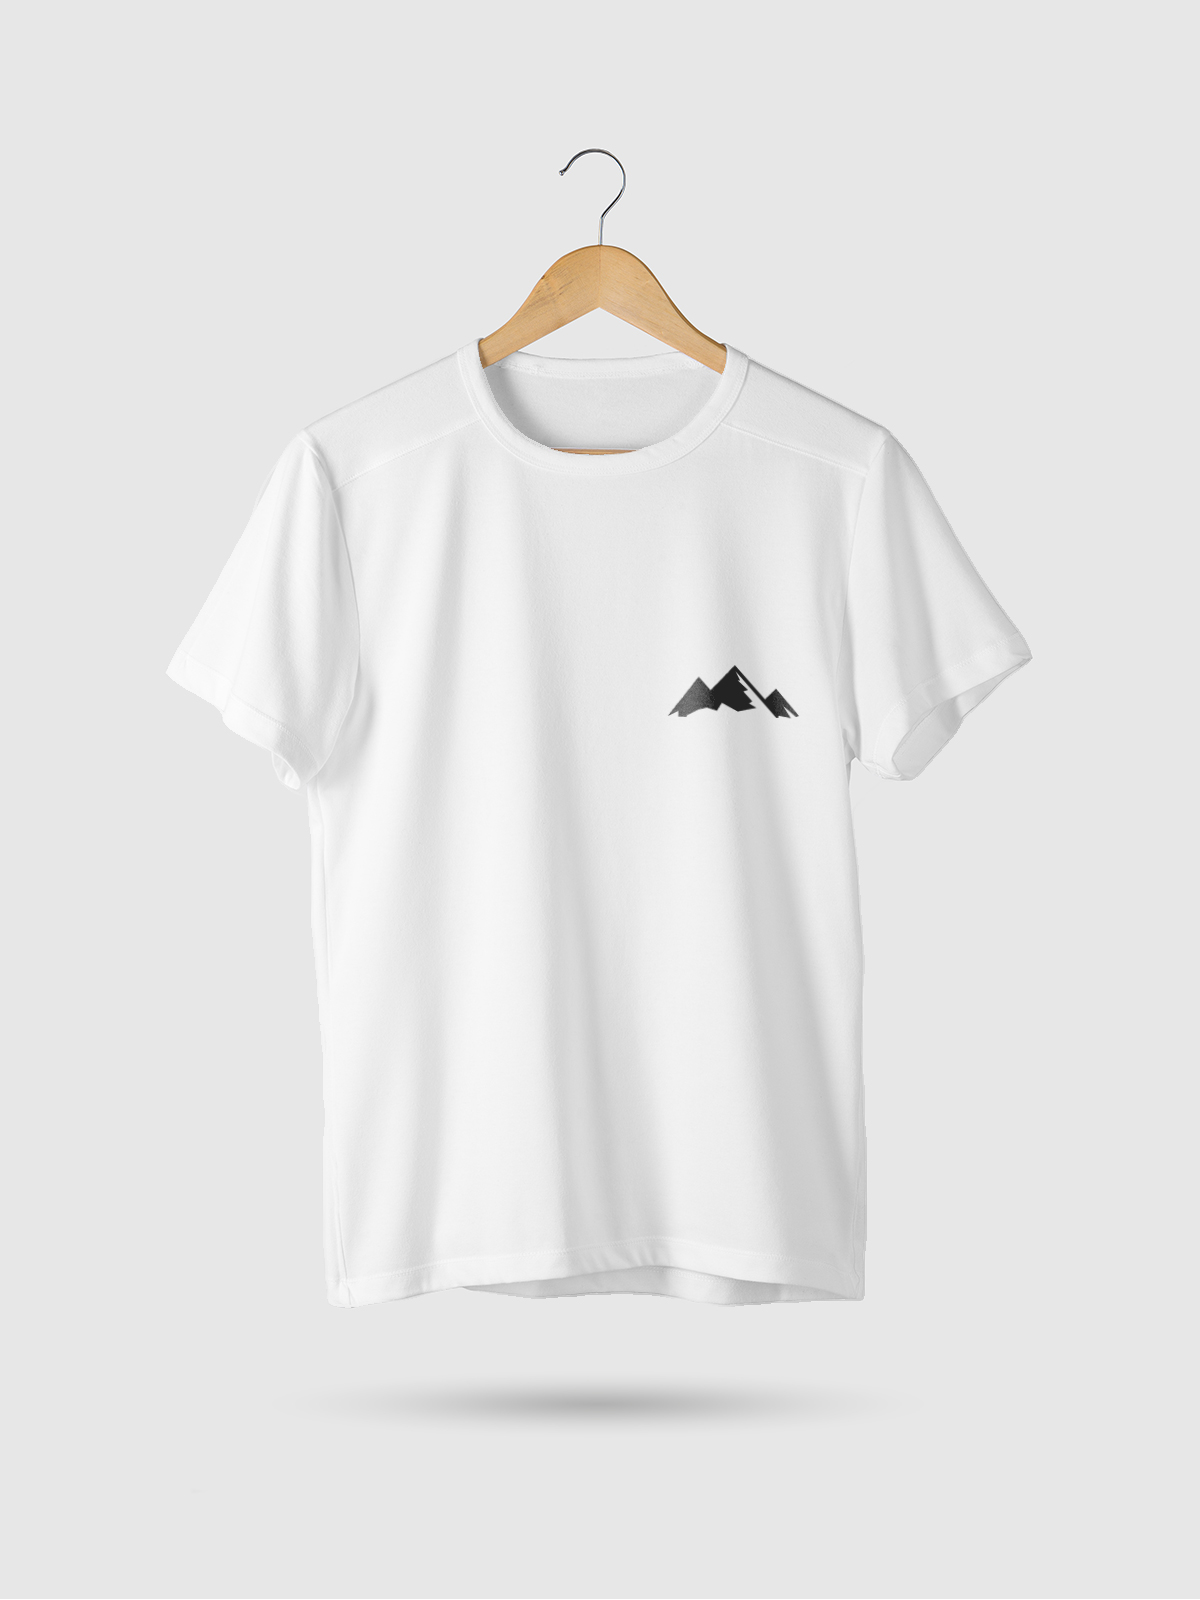 VanLife Clothing Tshirt T-shirt white Campervan